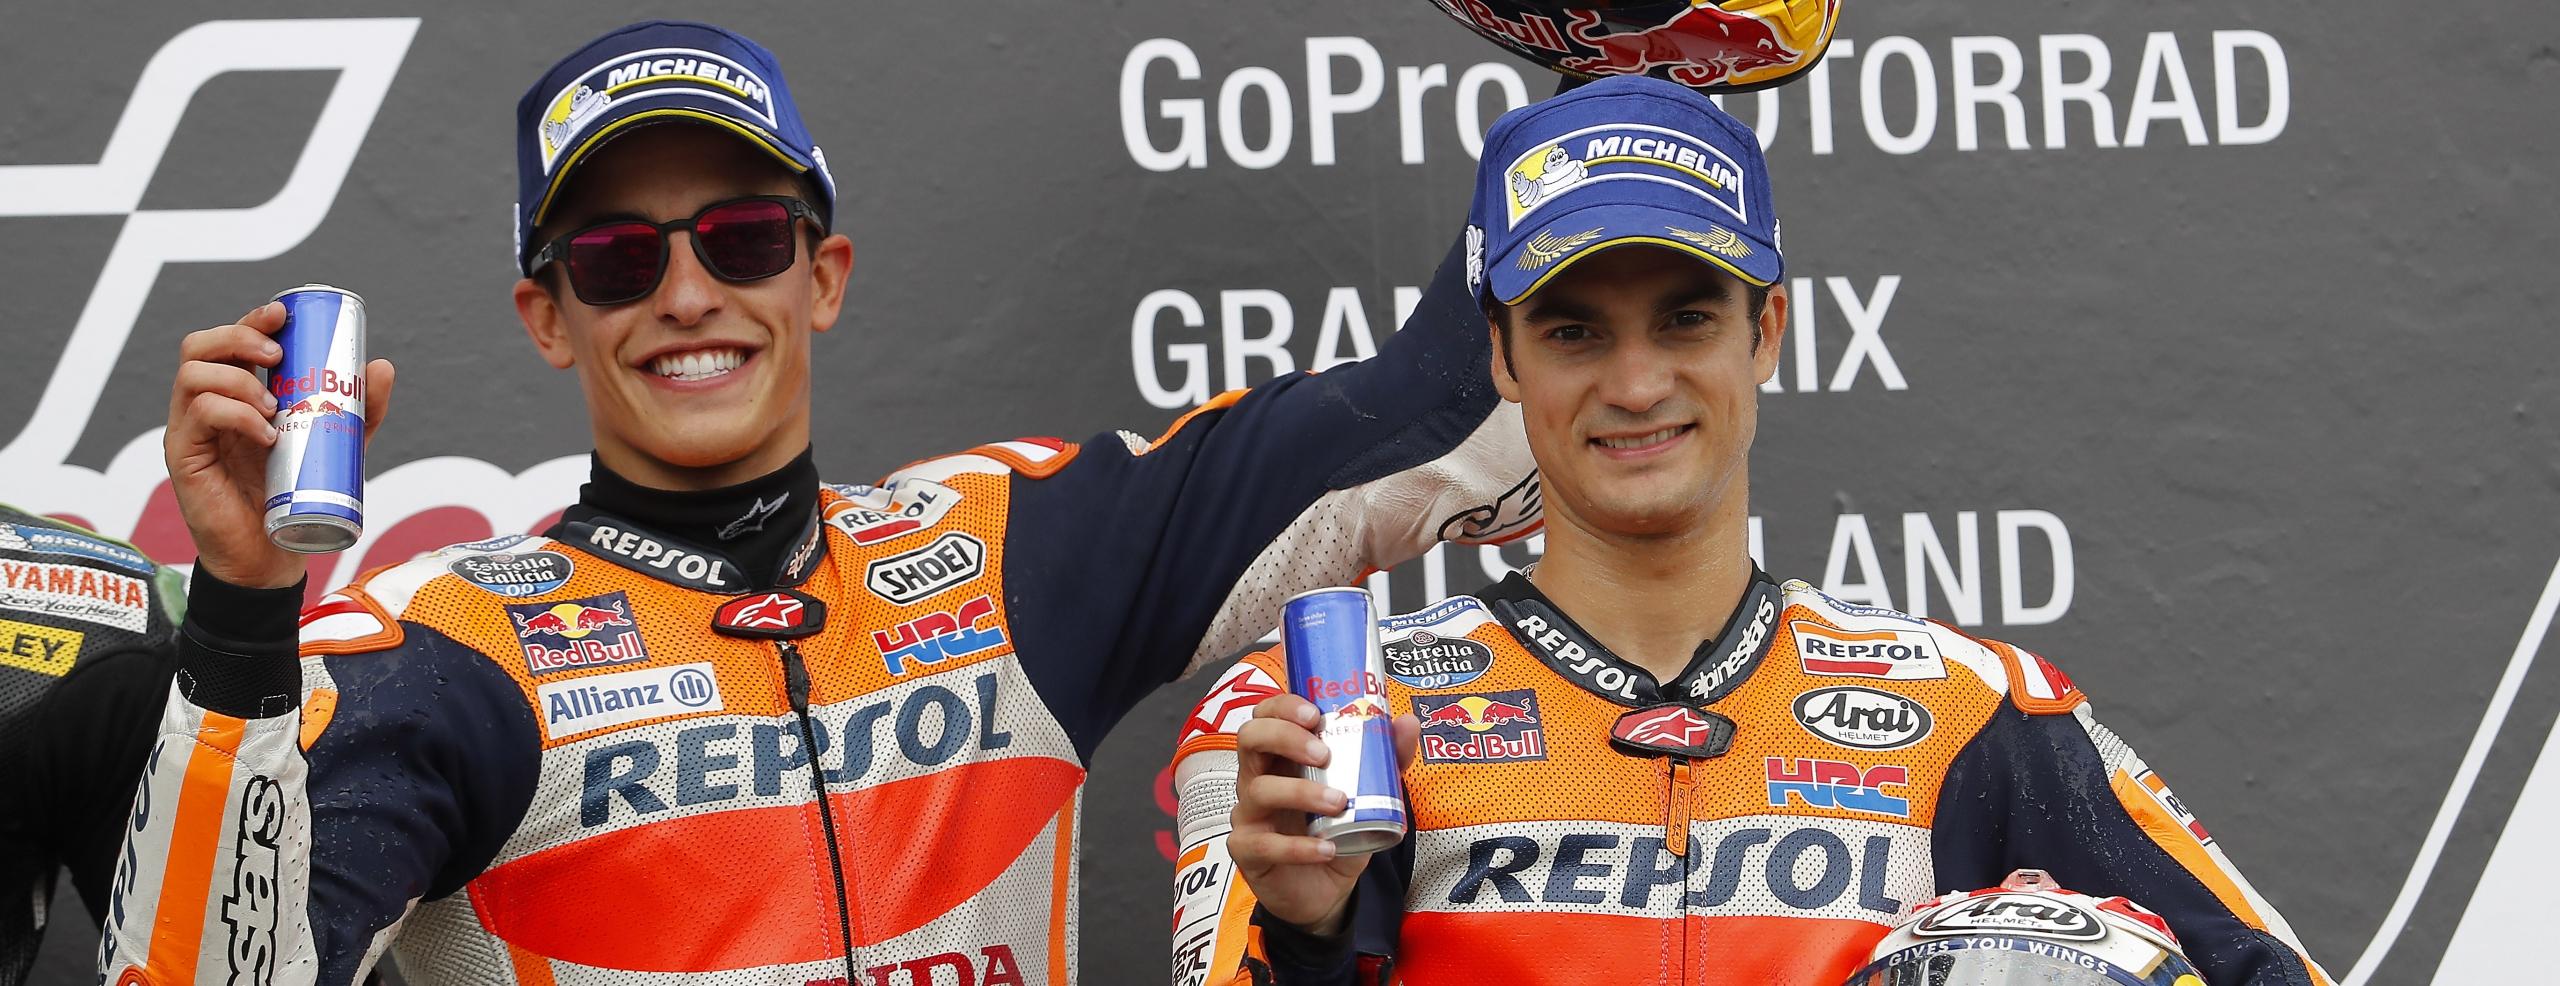 Eighth Sachsenring win for Marquez, Pedrosa third for fourth Repsol Honda Team double-podium this season